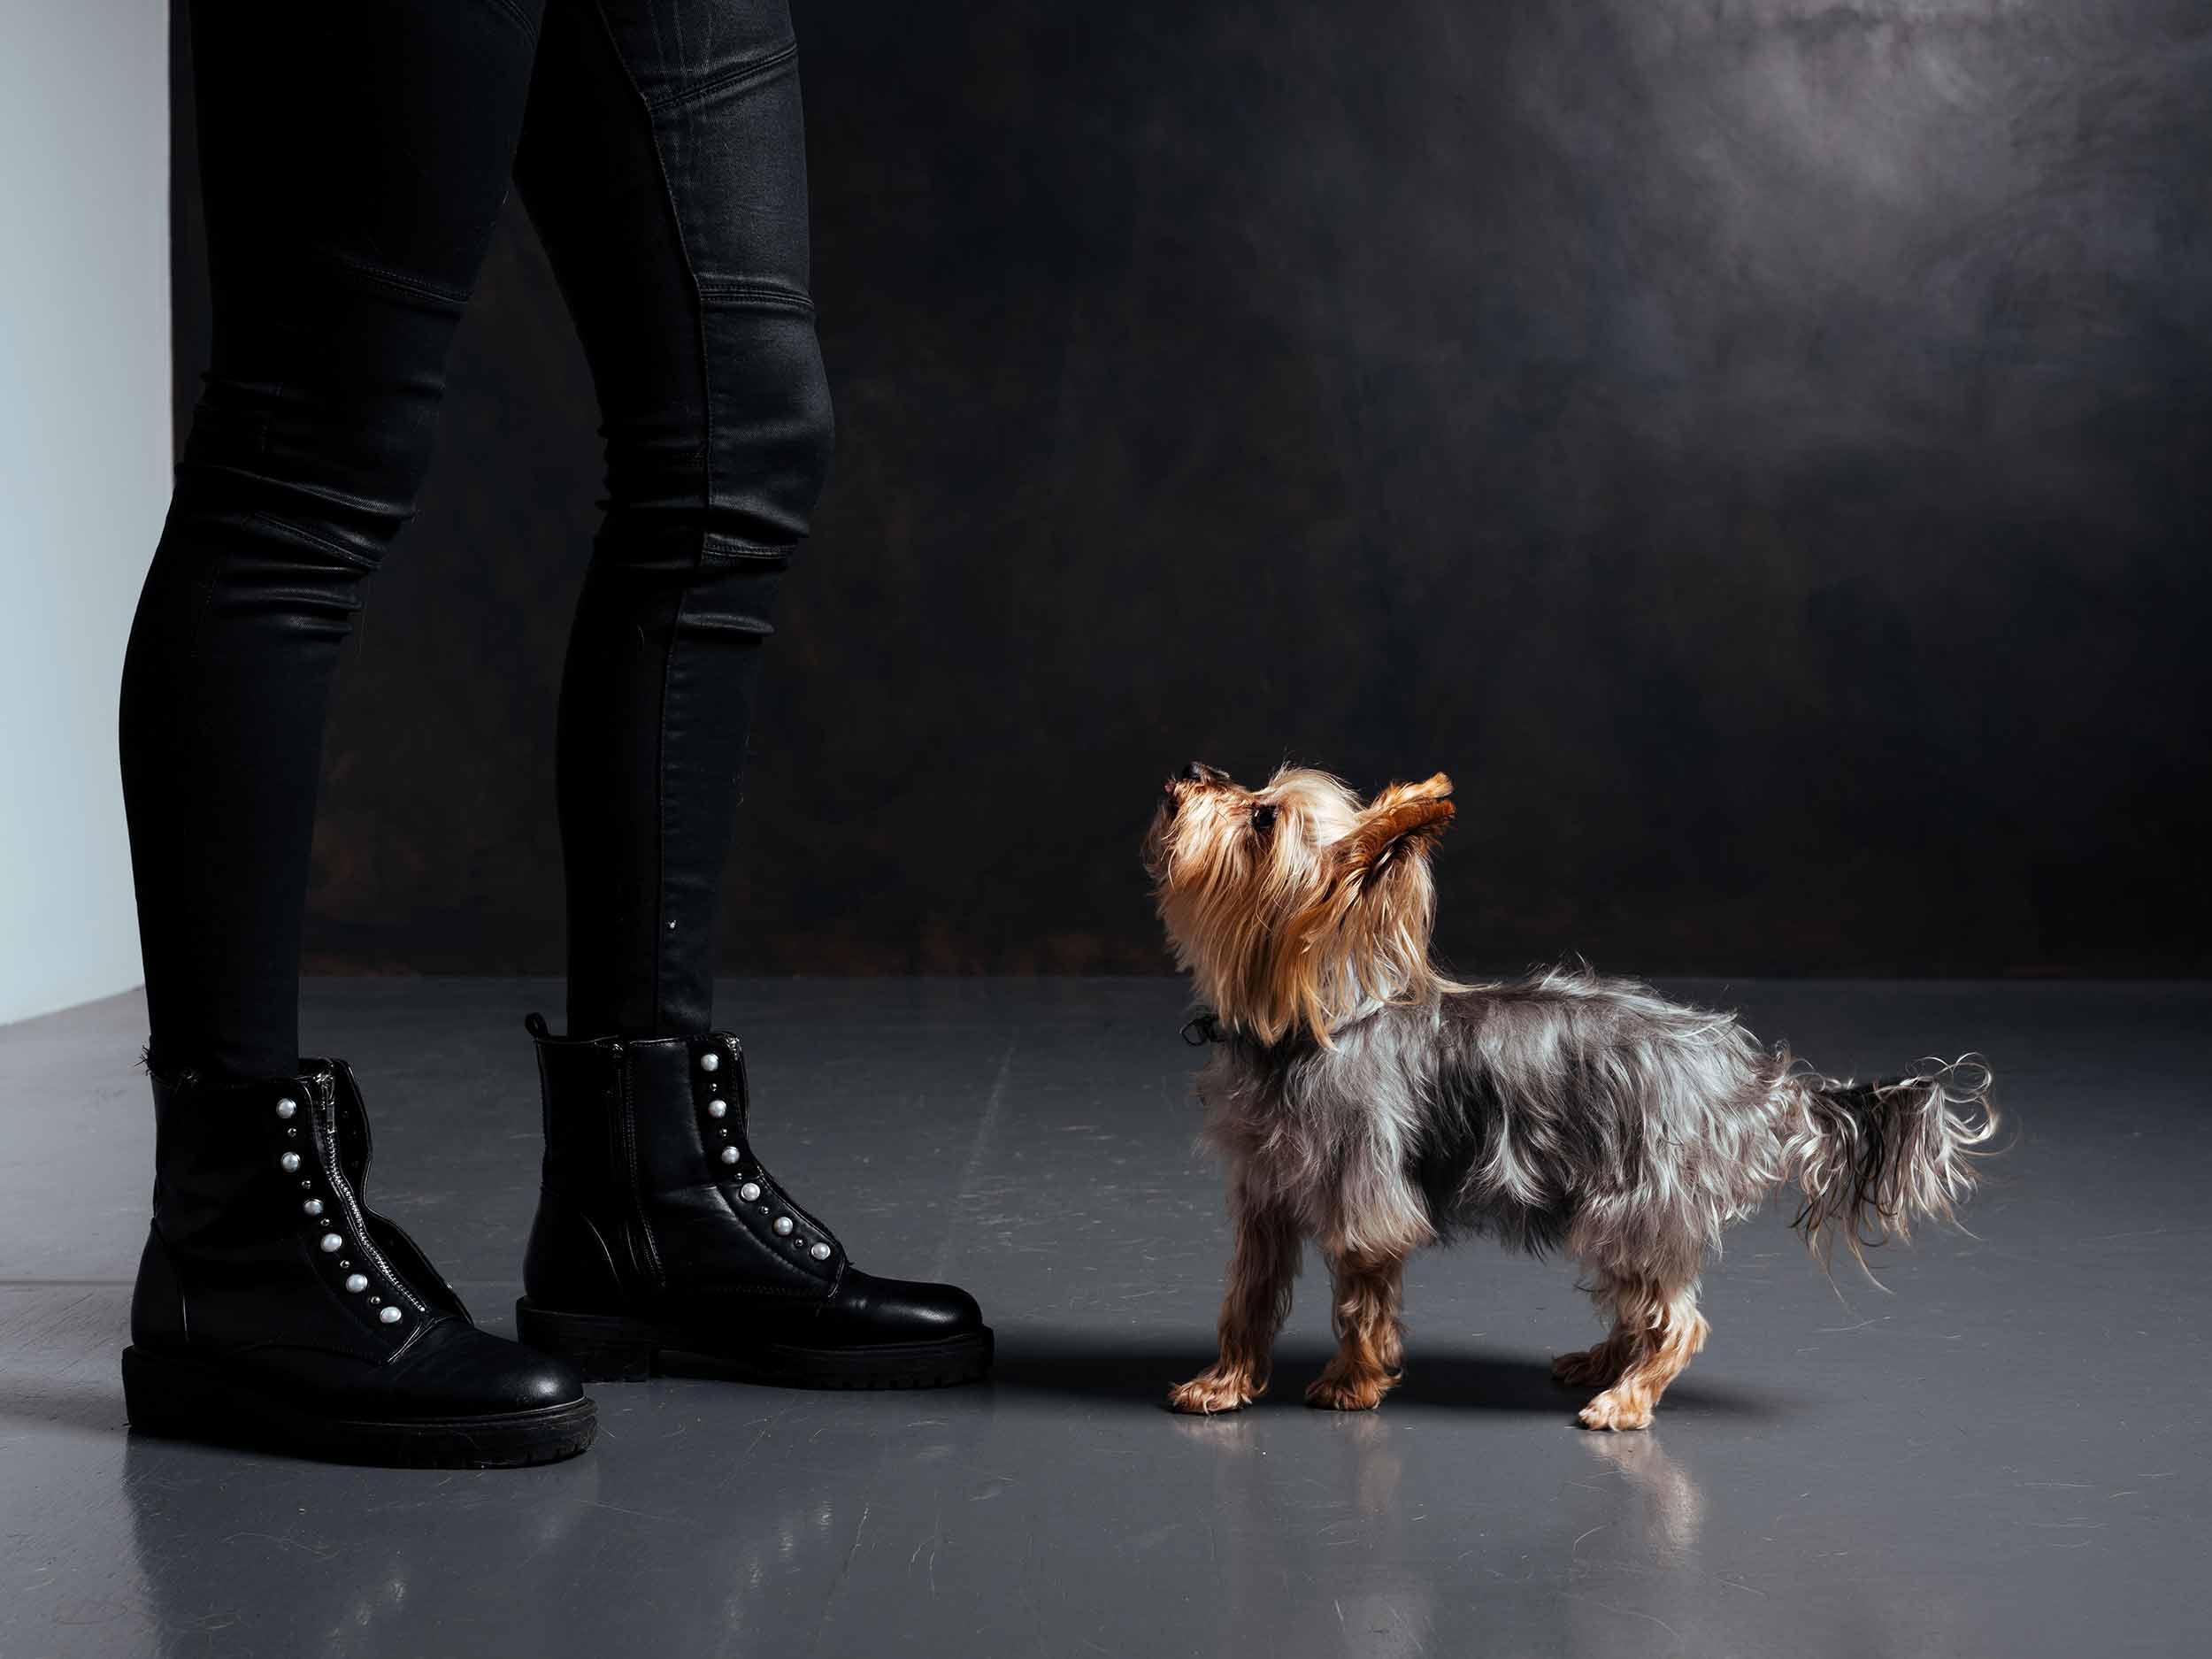 12.01---Dogs-Life_0021_9724.jpg